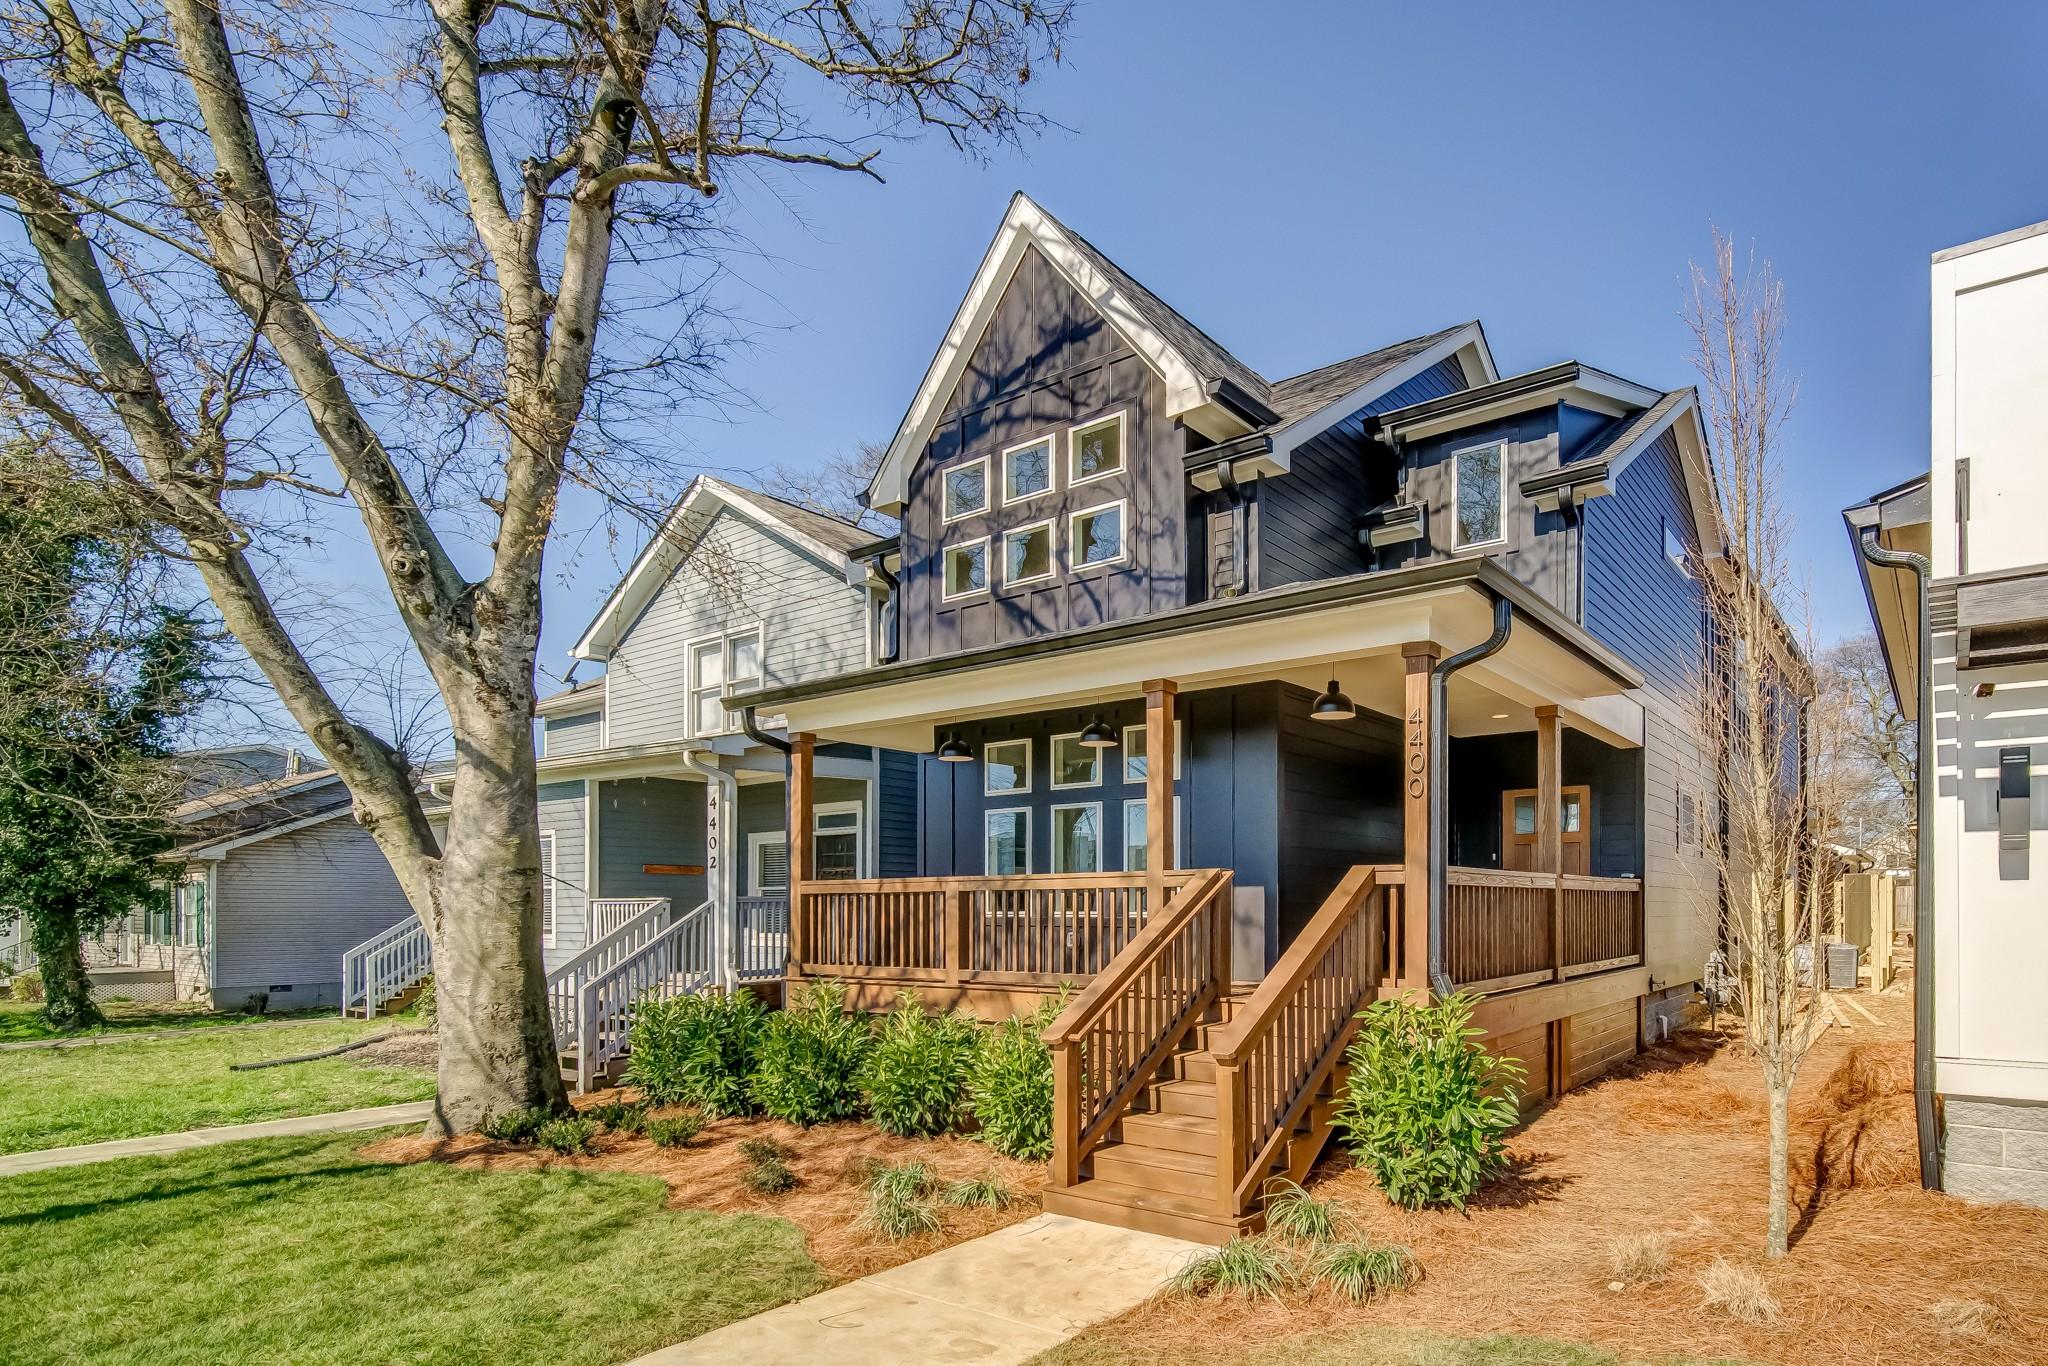 4400 Delaware Ave, Nashville, TN 37209 - Nashville, TN real estate listing